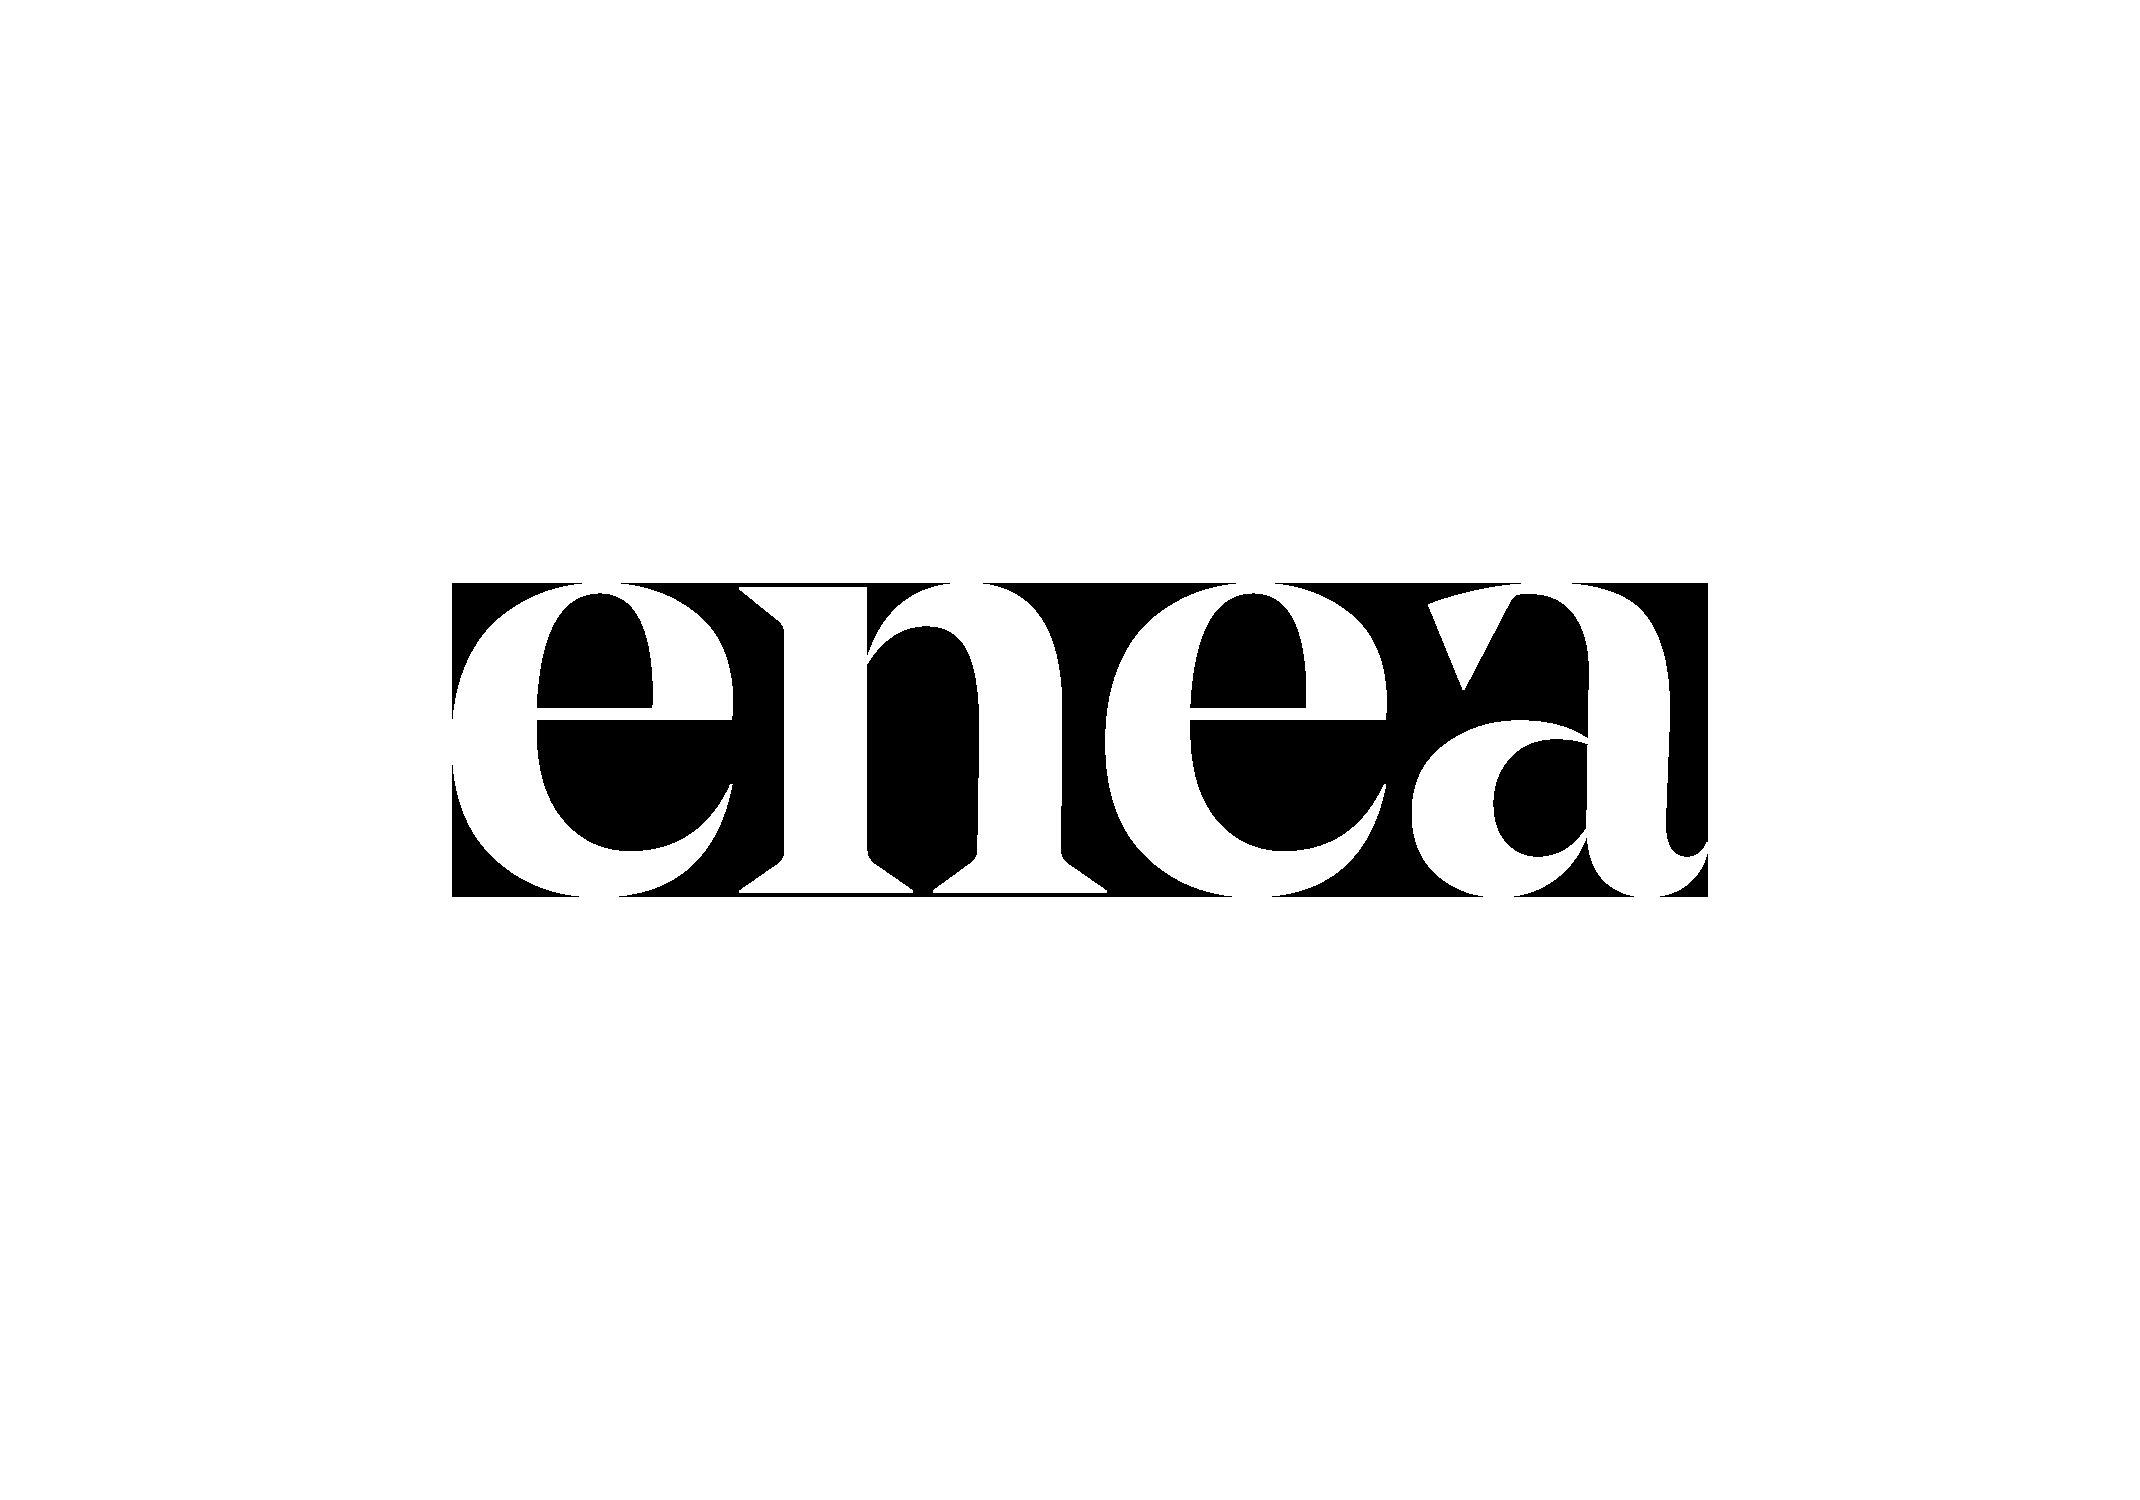 identidad corporativa branding enea clase – Clase bcn